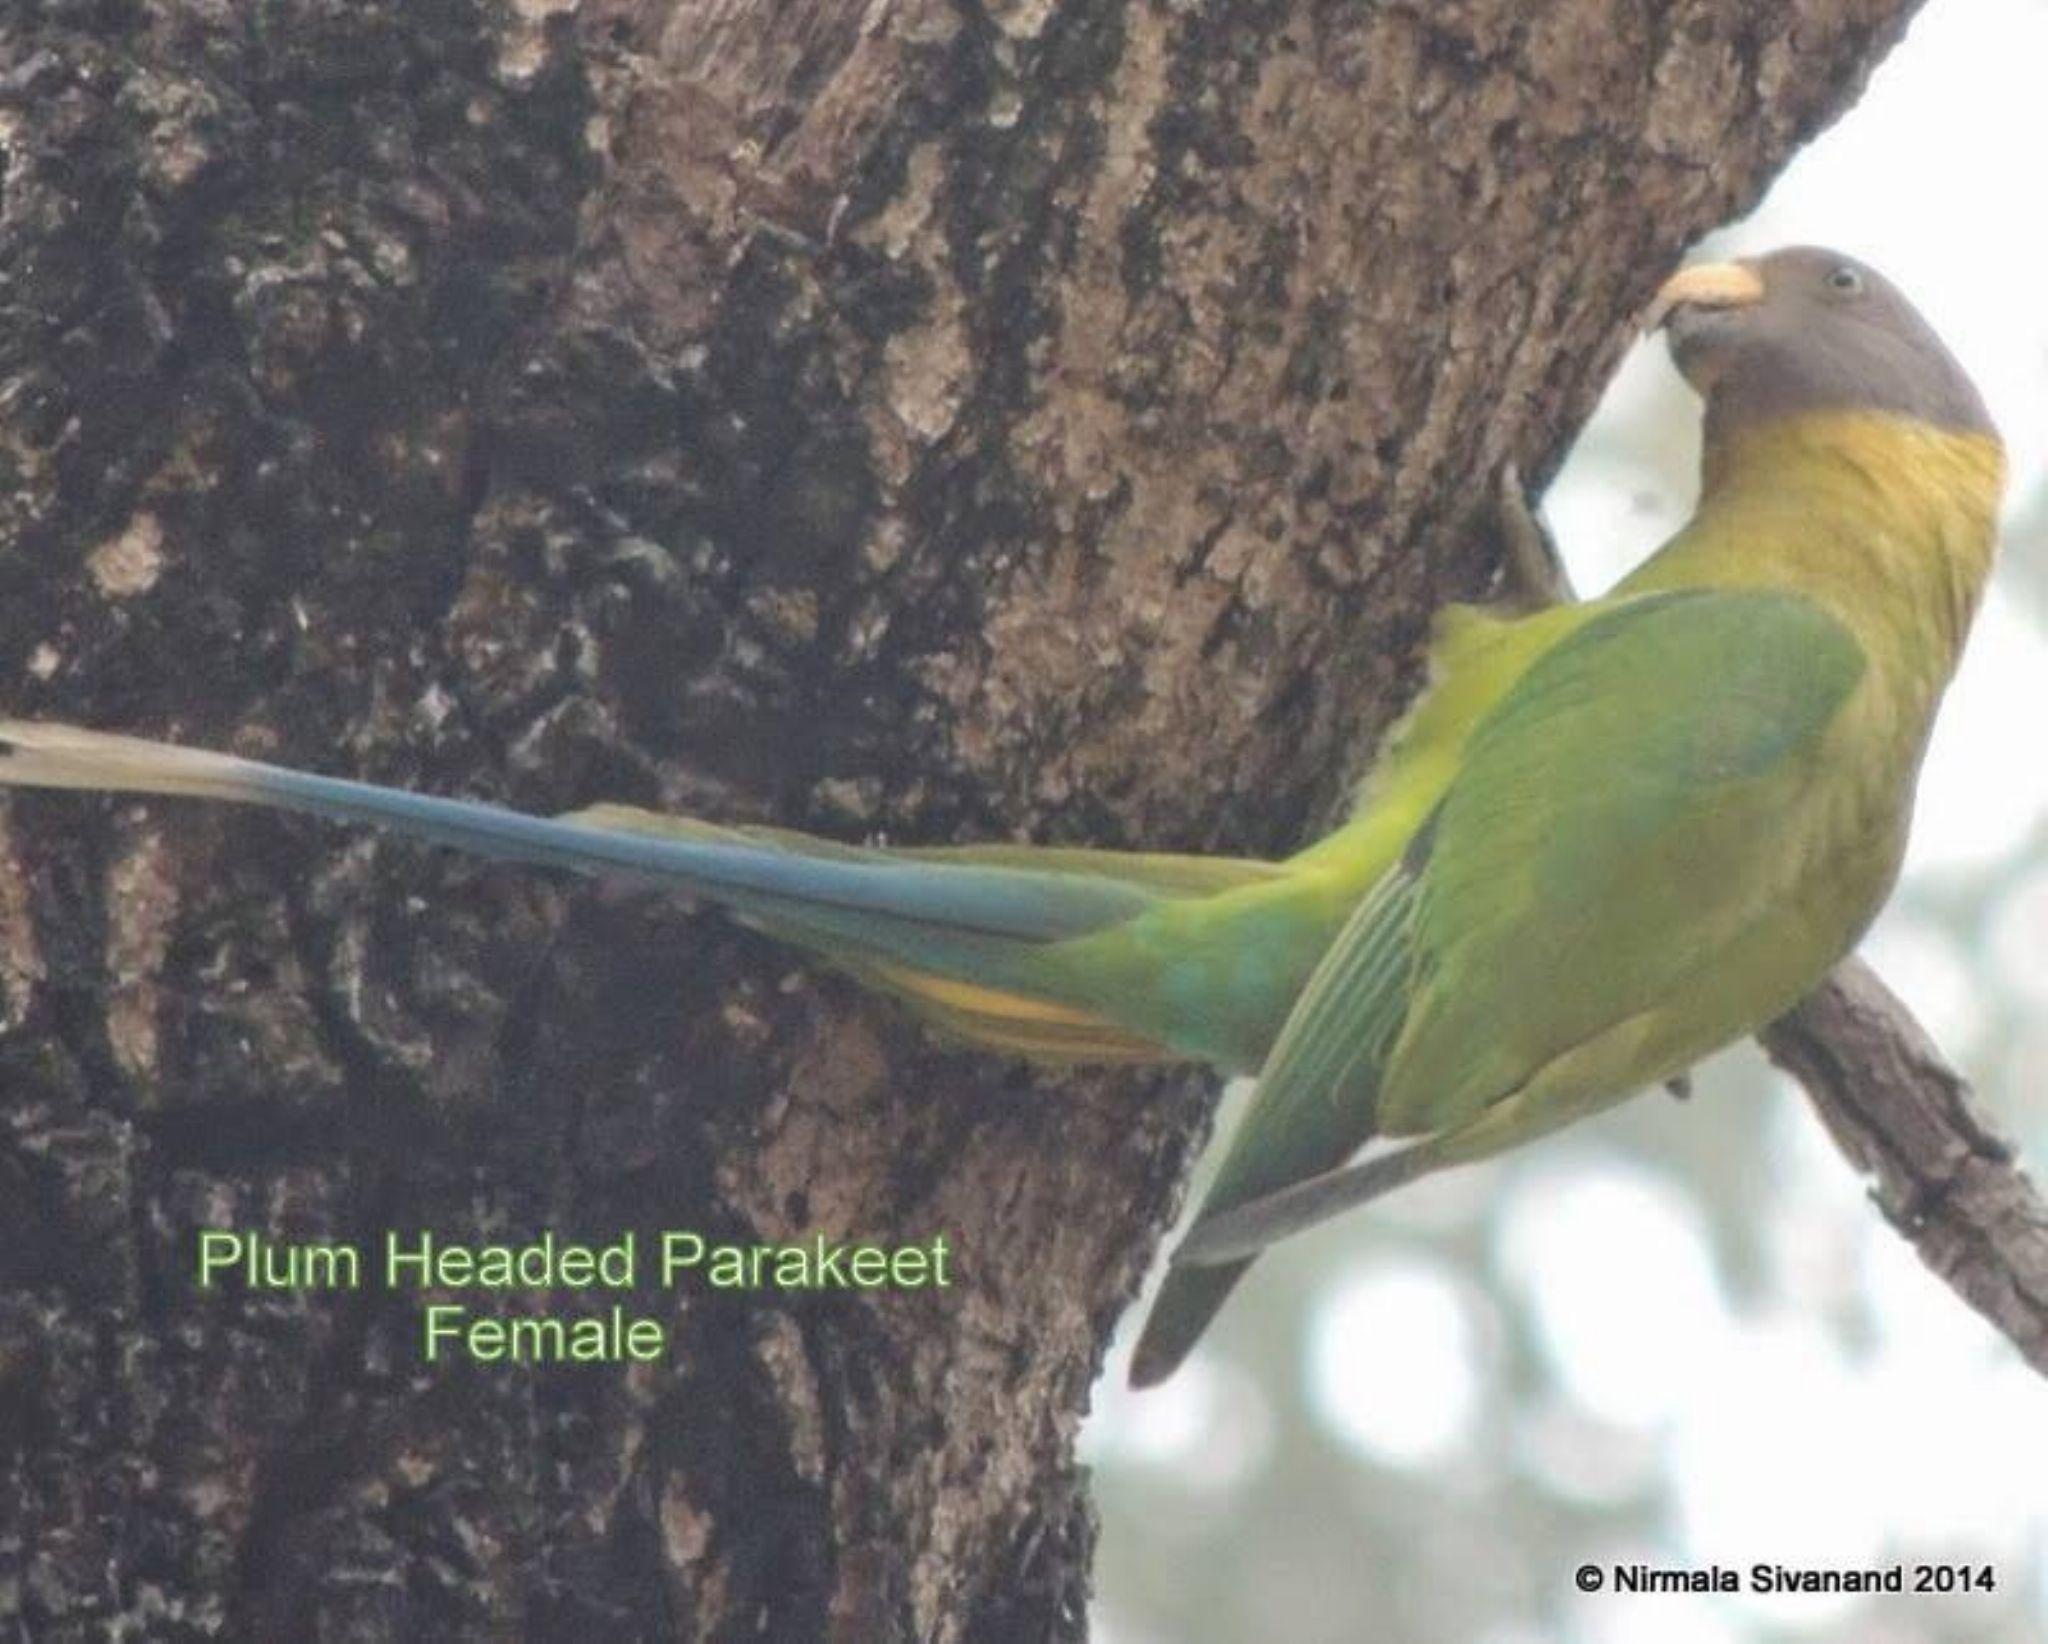 Plum headed parakeet by Nirmala Sivanand